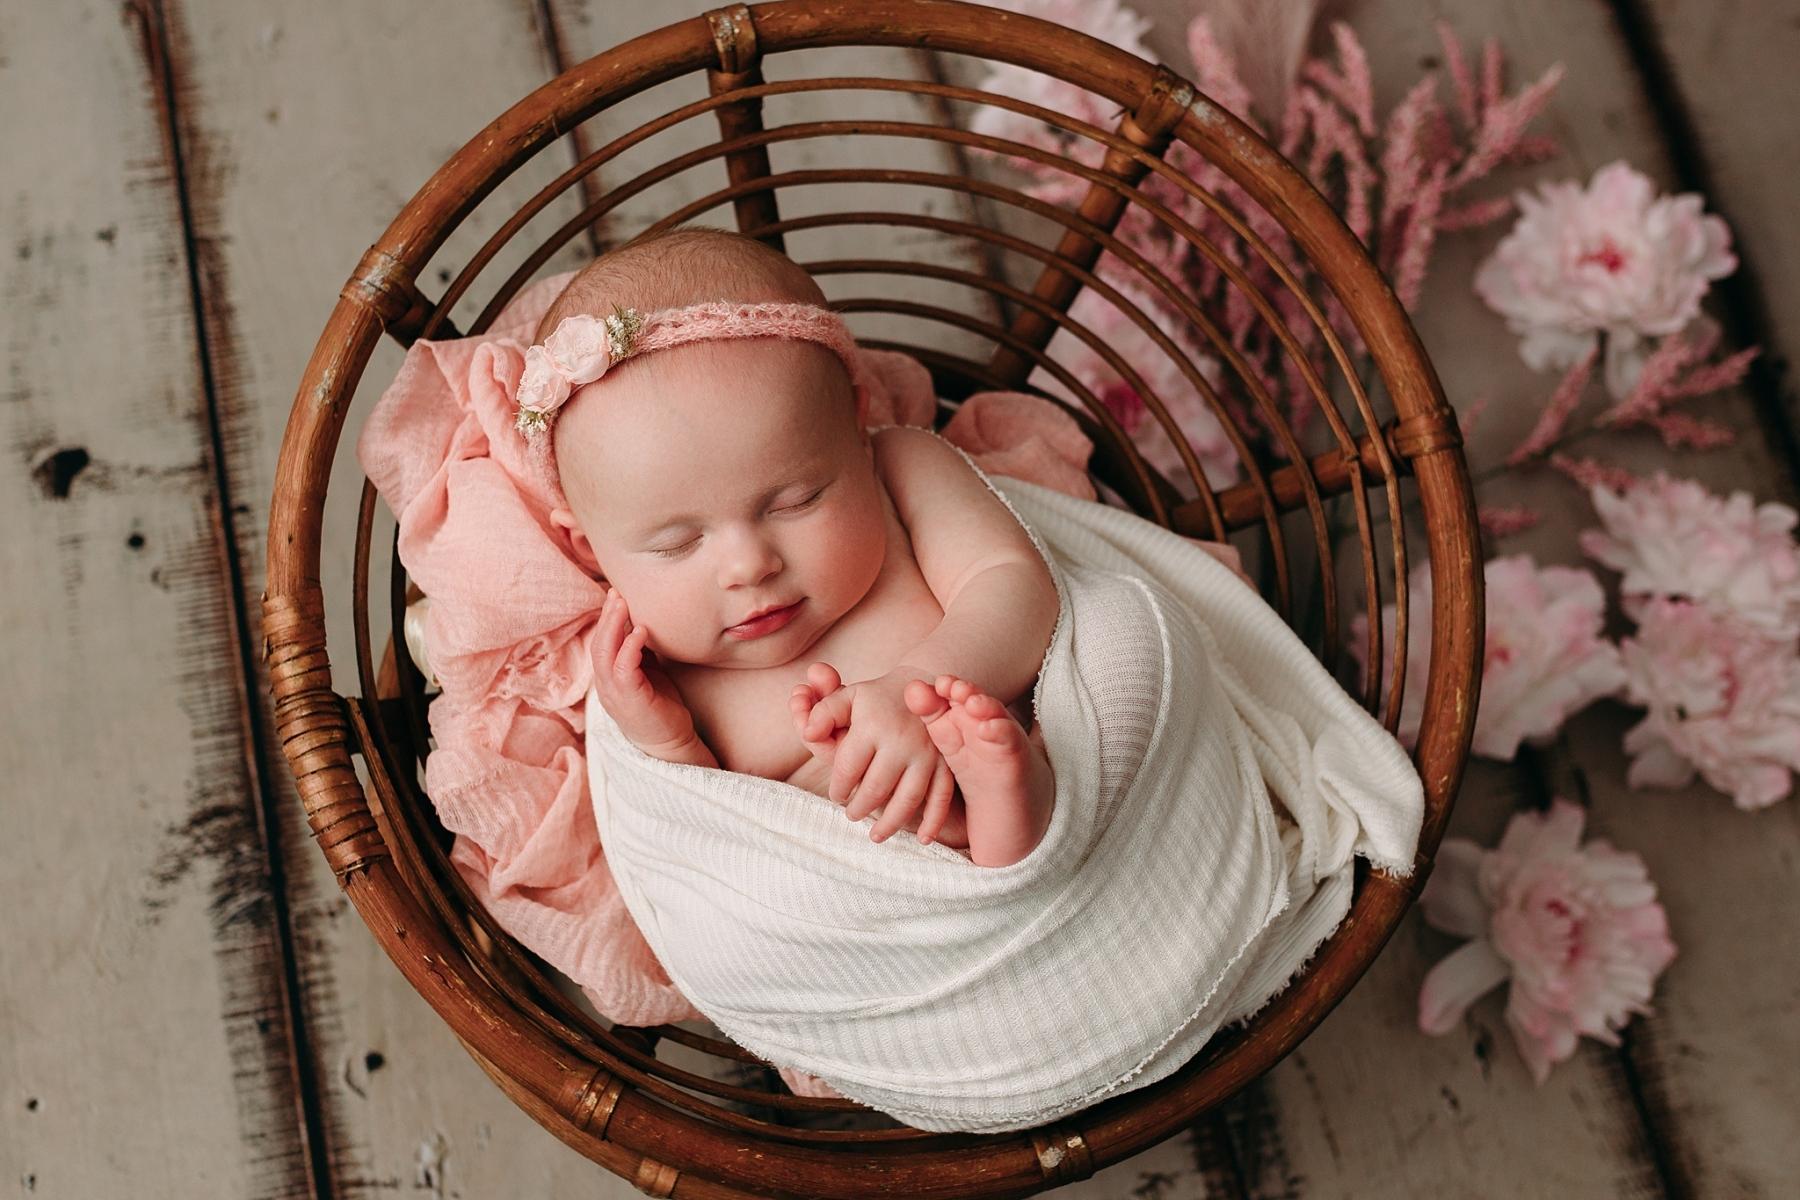 brown bowl holding newborn girl sleeping during milestone photo session